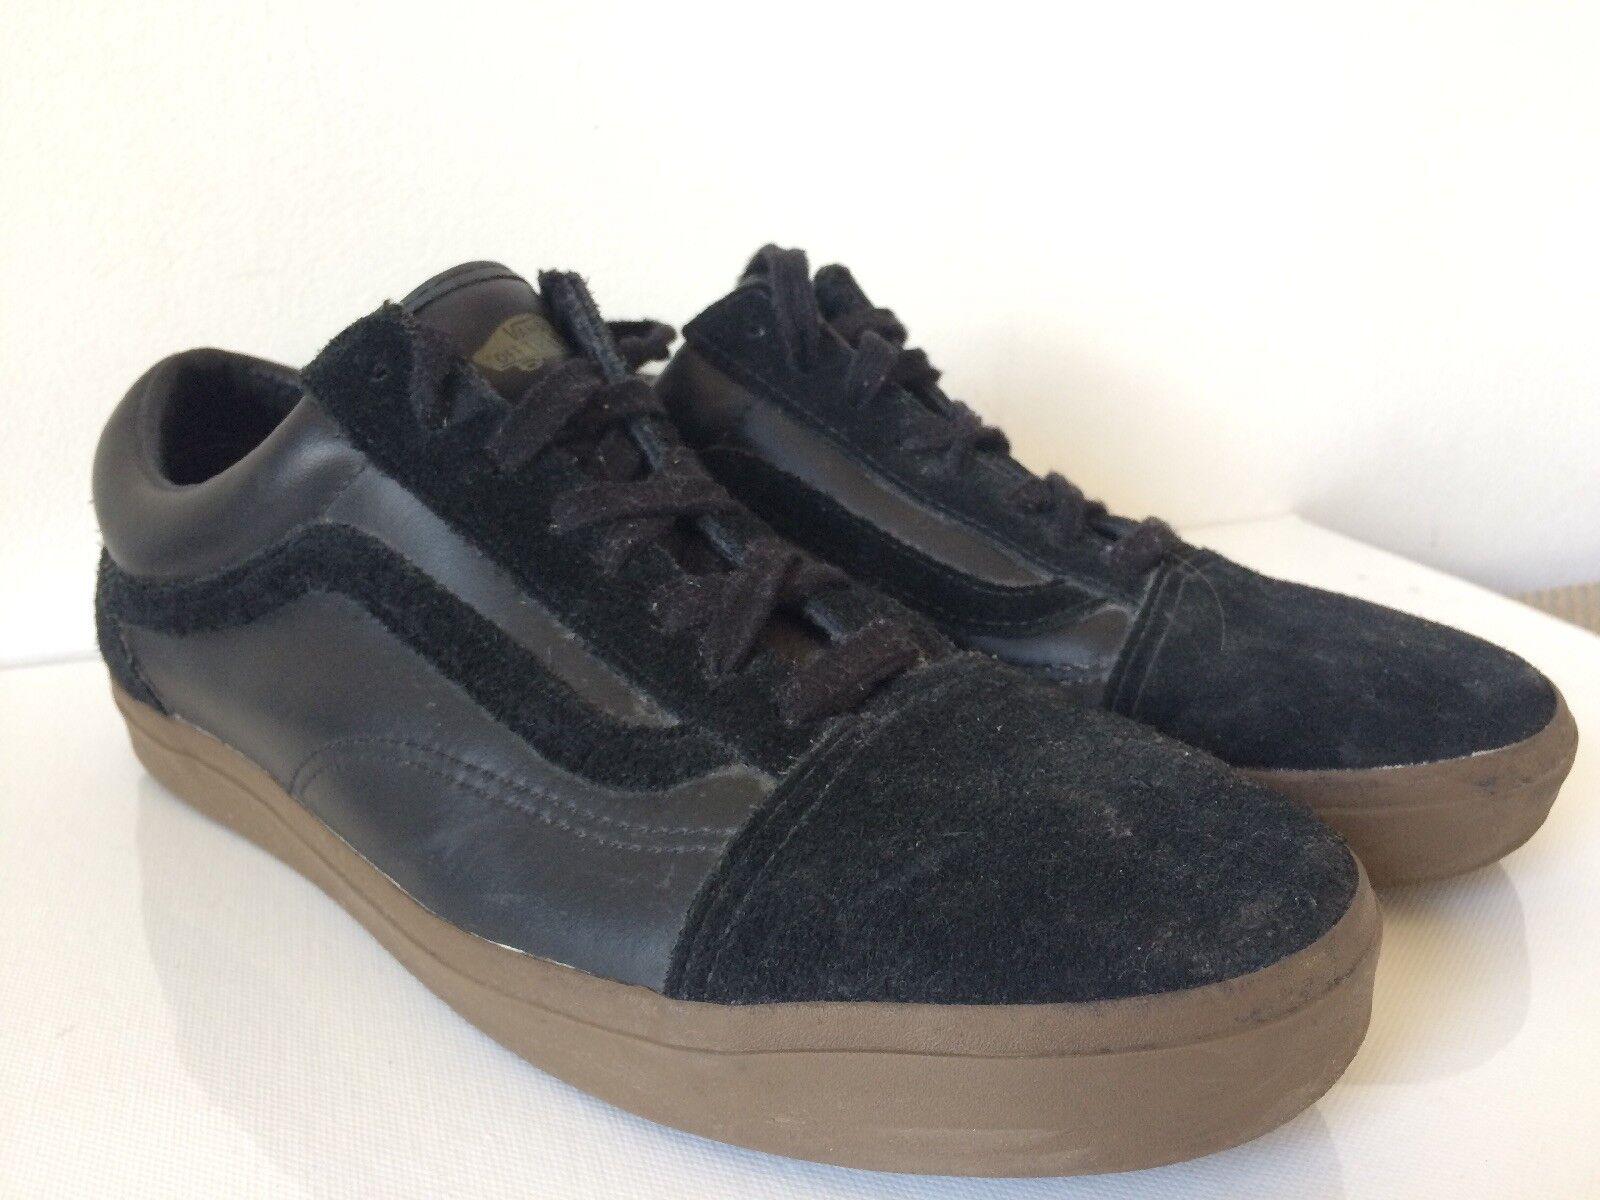 Supreme x Vans Old Skool '92 Zero Black  Gum F W 2010 size UK 8